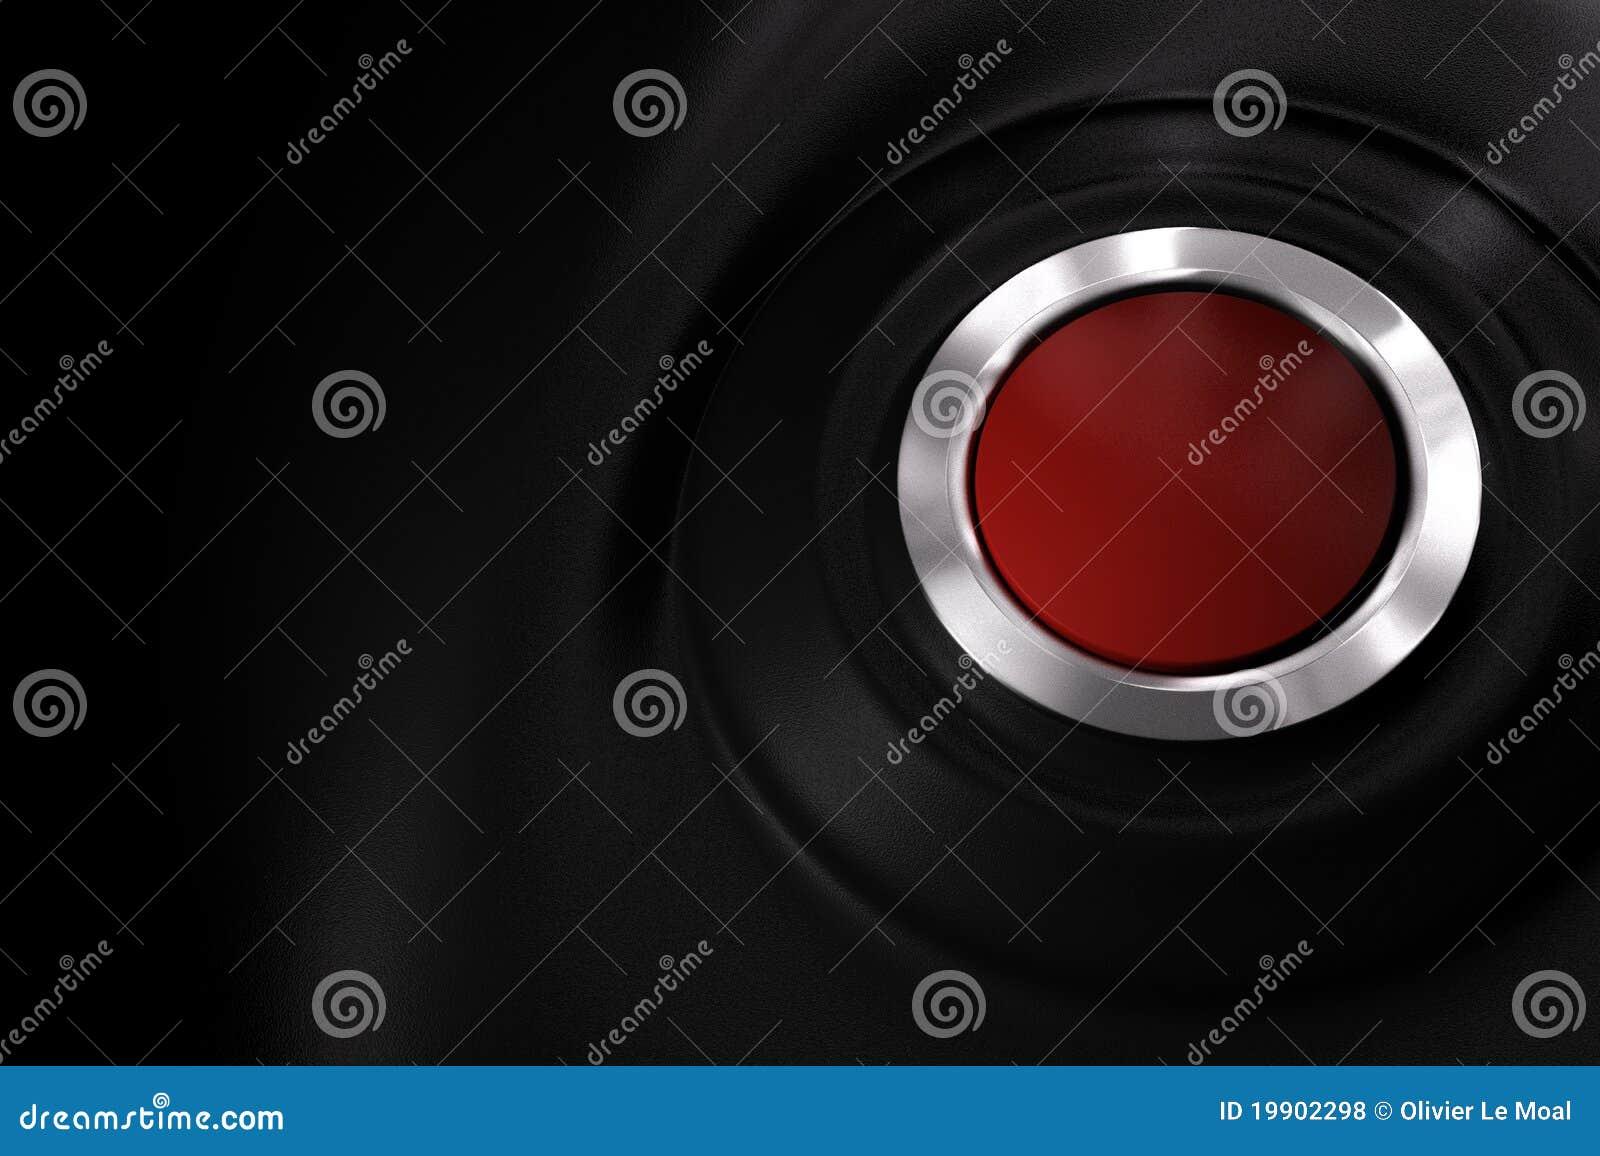 Push Button Royalty Free Stock Photos Image 19902298